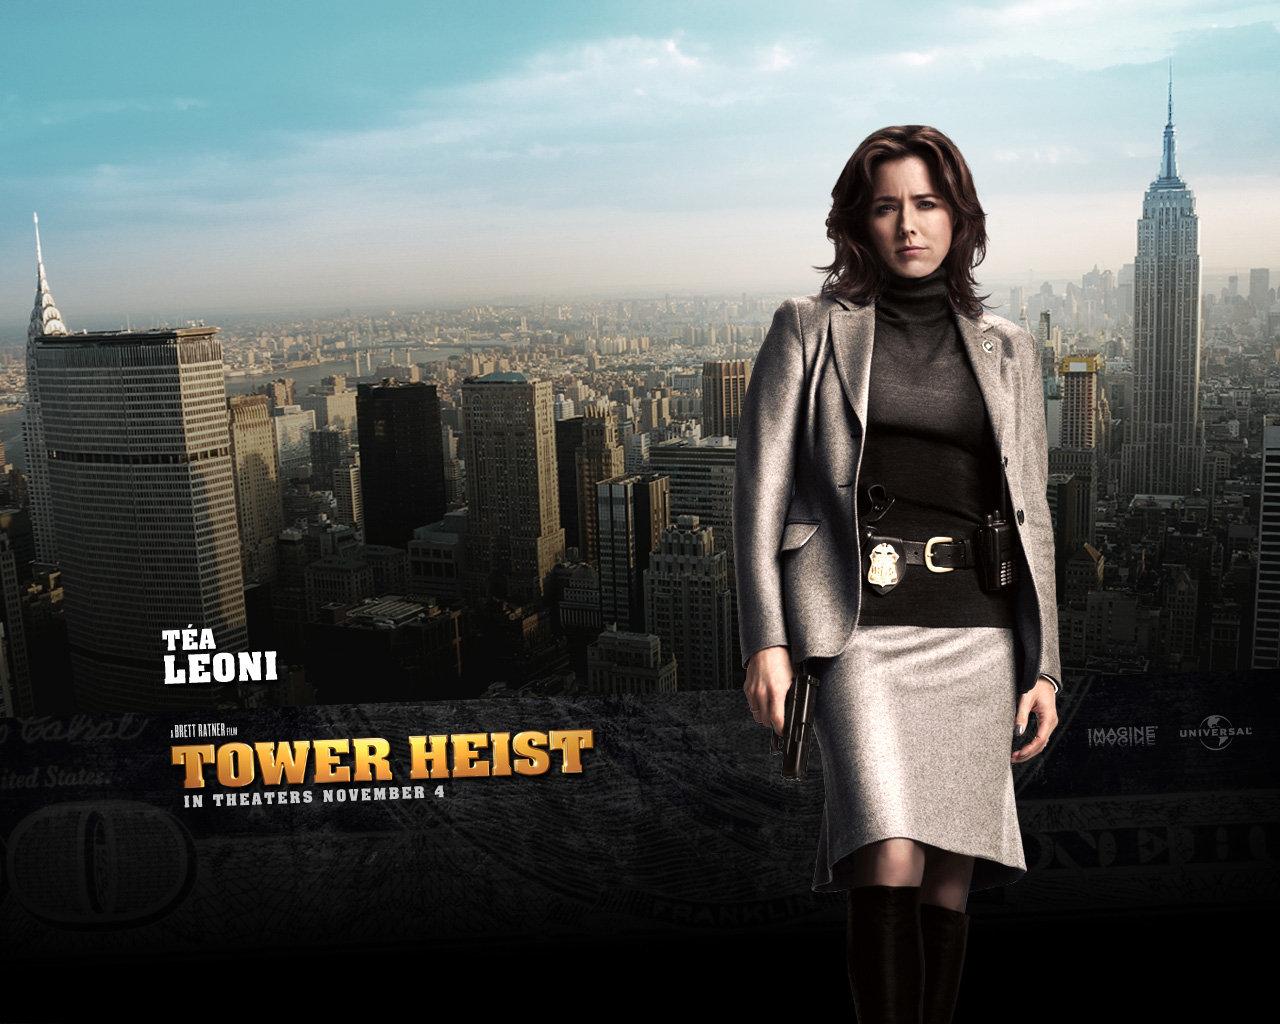 http://2.bp.blogspot.com/-9x4POmbD-eA/TwvWdfPqZ1I/AAAAAAAAEUc/ThrYRsCxKi0/s1600/Tower-Heist-Wallpaper-05.jpg